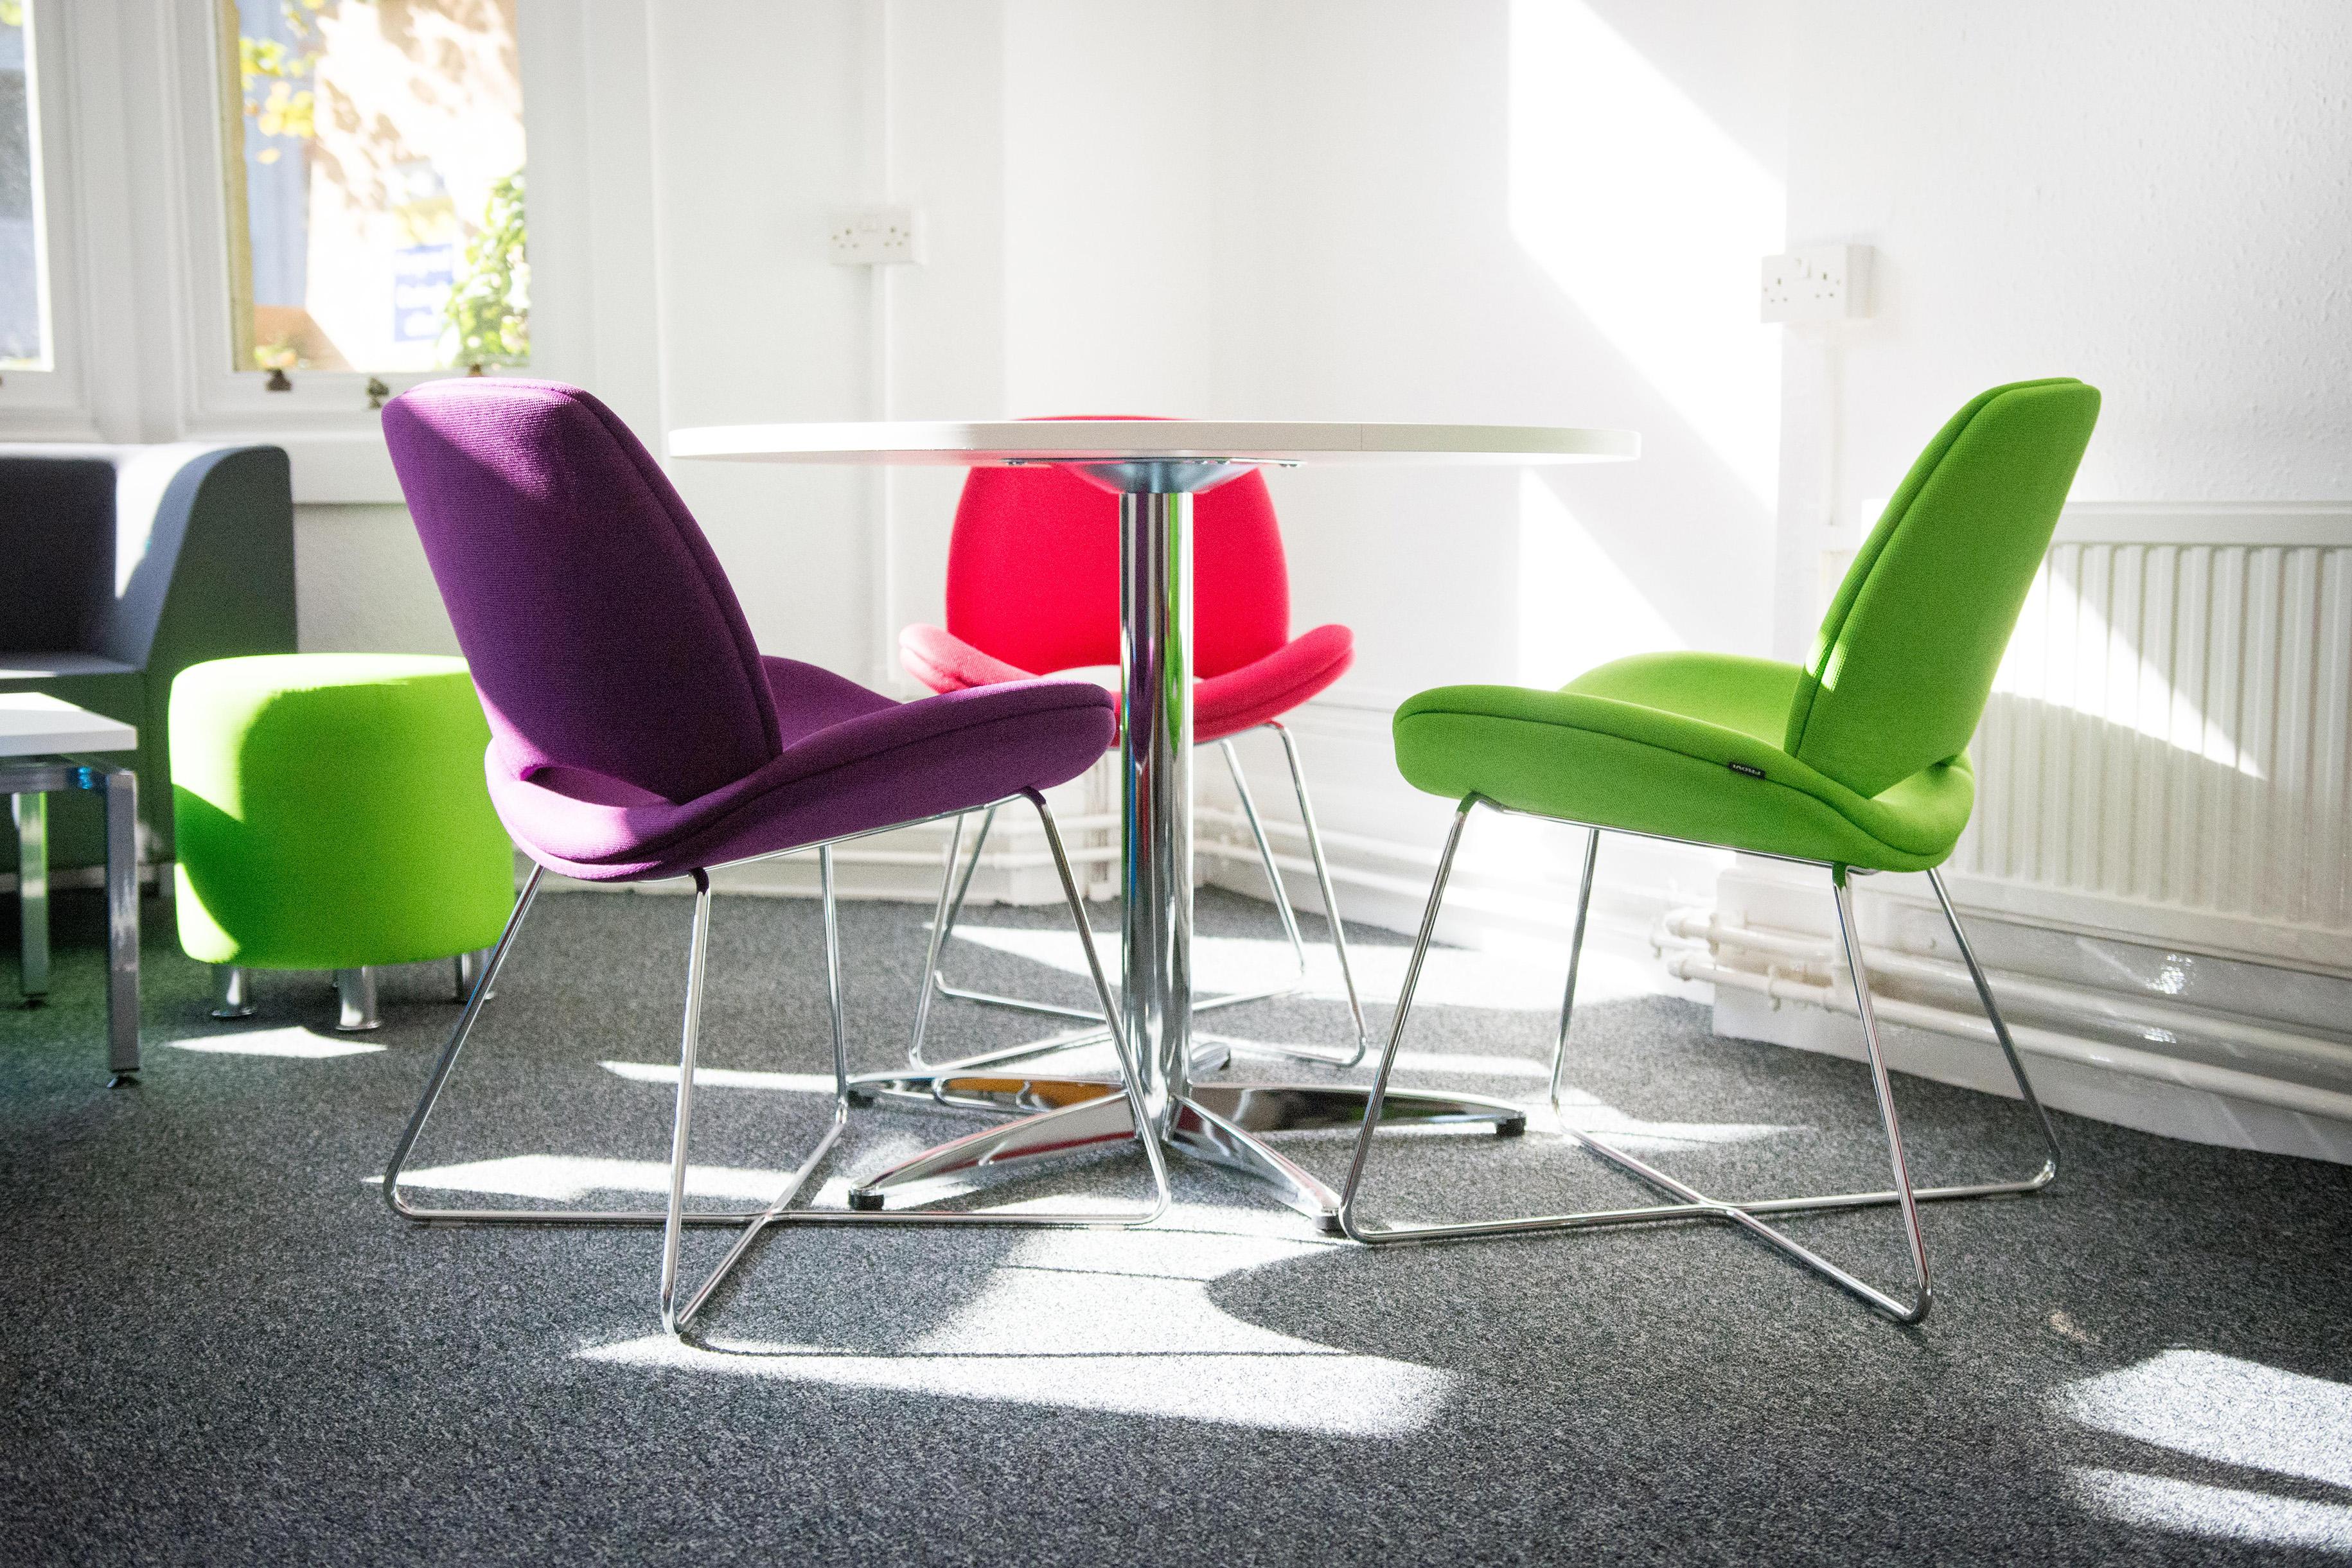 Cardiff University Social Space DG Office Interiors